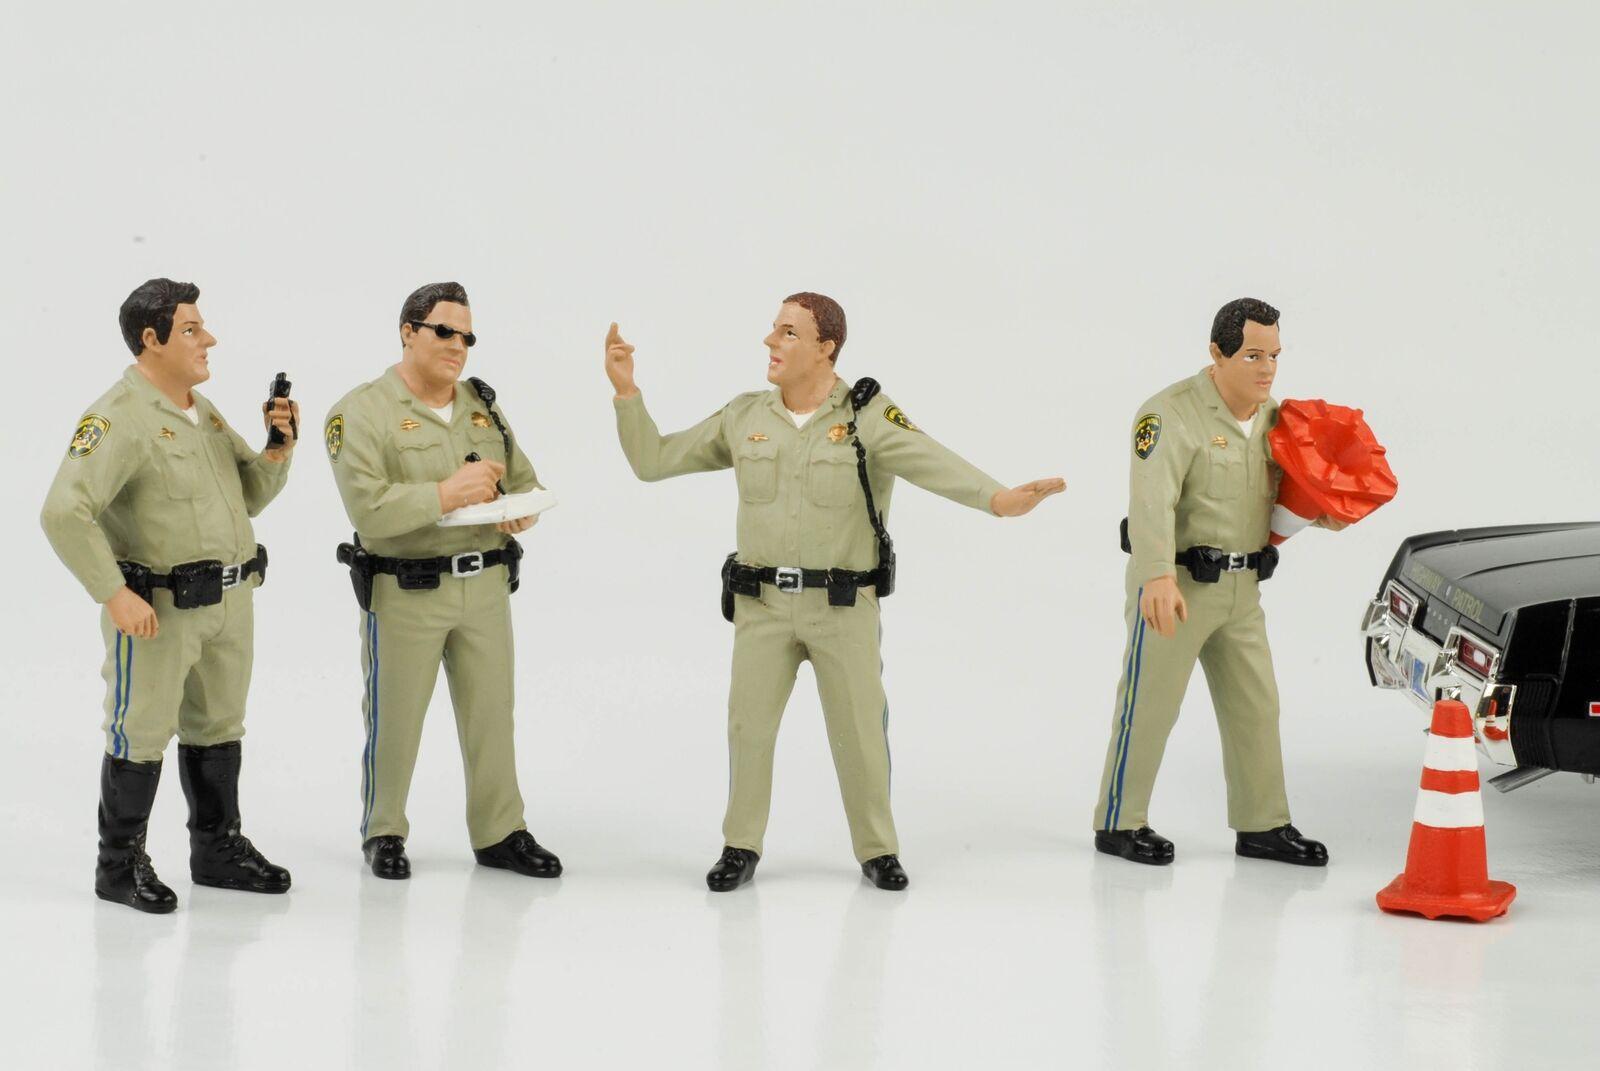 Highway Patrol police control set 4 figuras figura figura figura 1 18 American Diorama no Car bcd4ac